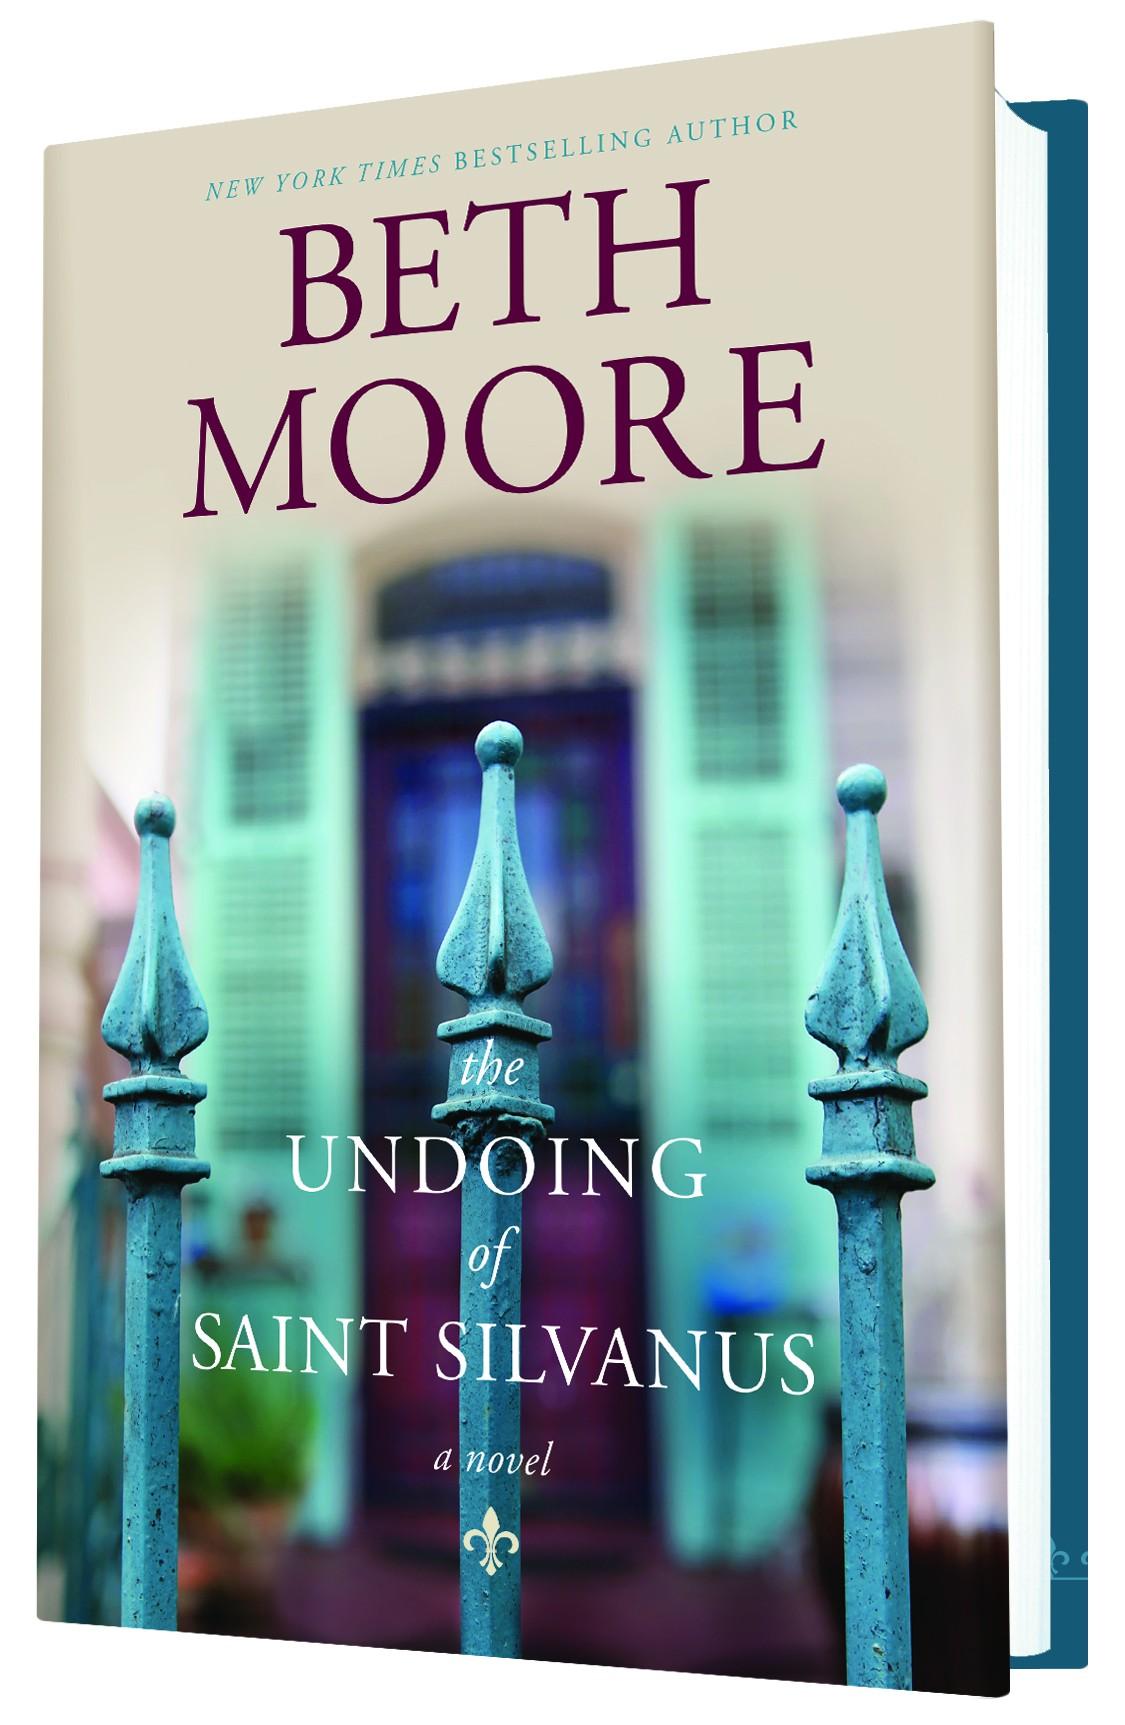 The Undoing of Saint Silvanus - TRADEBOOK